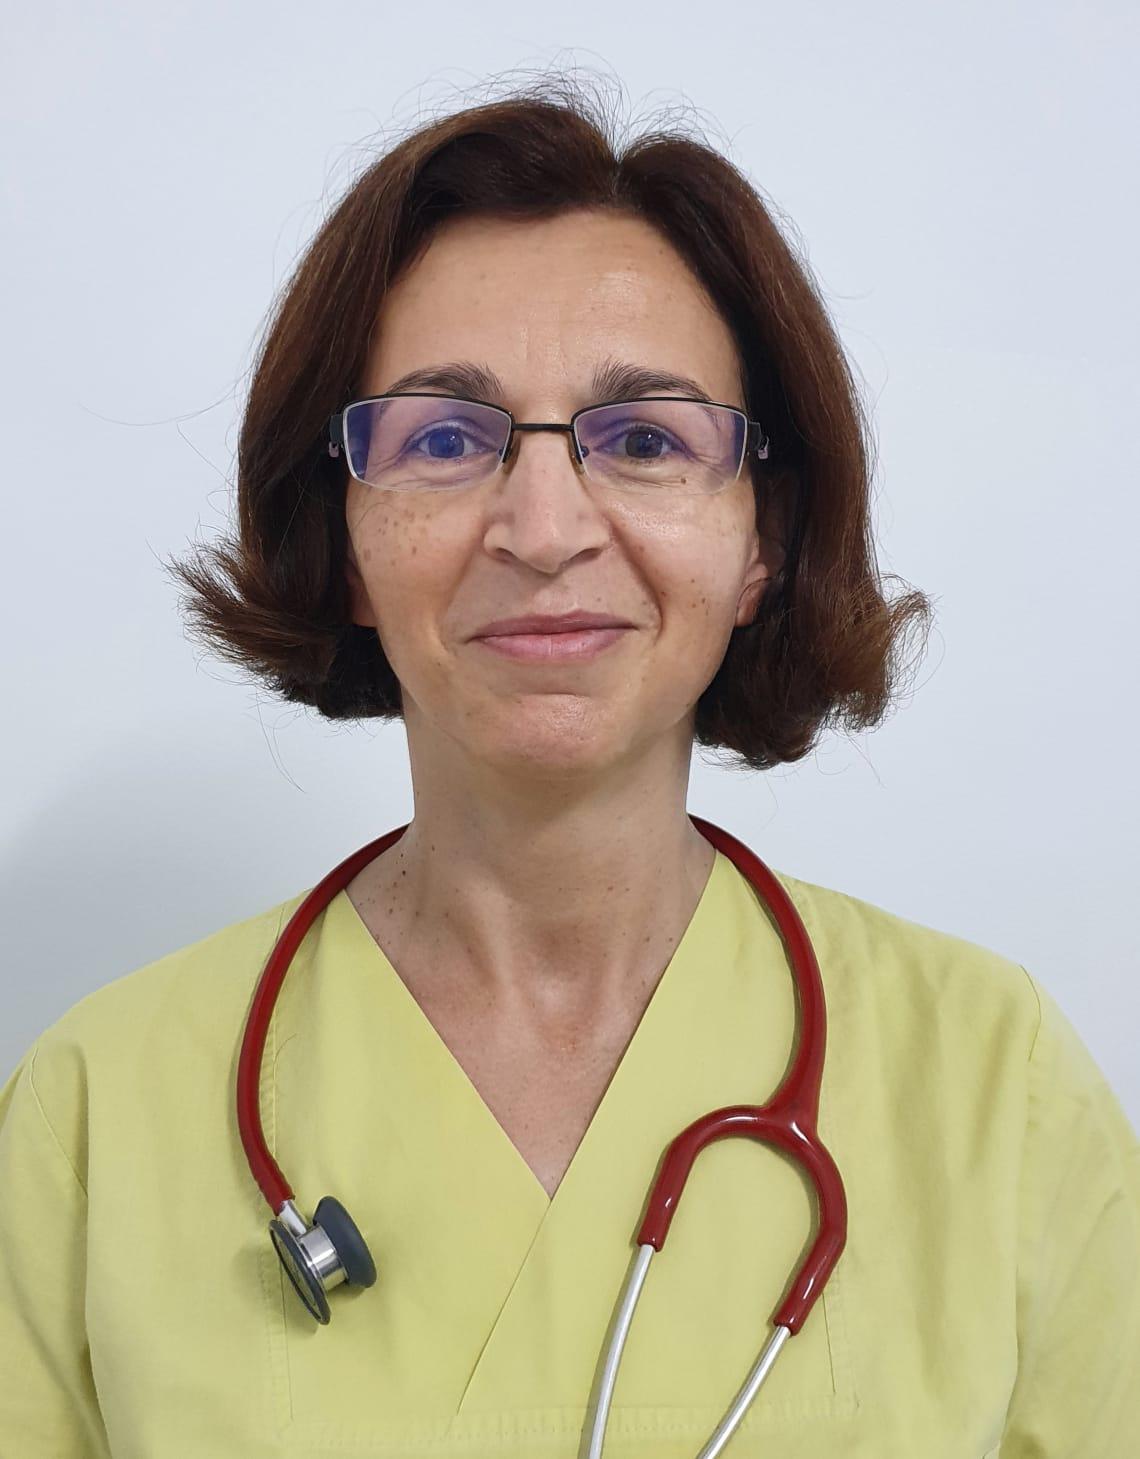 Dr. Soaita Oana CPU